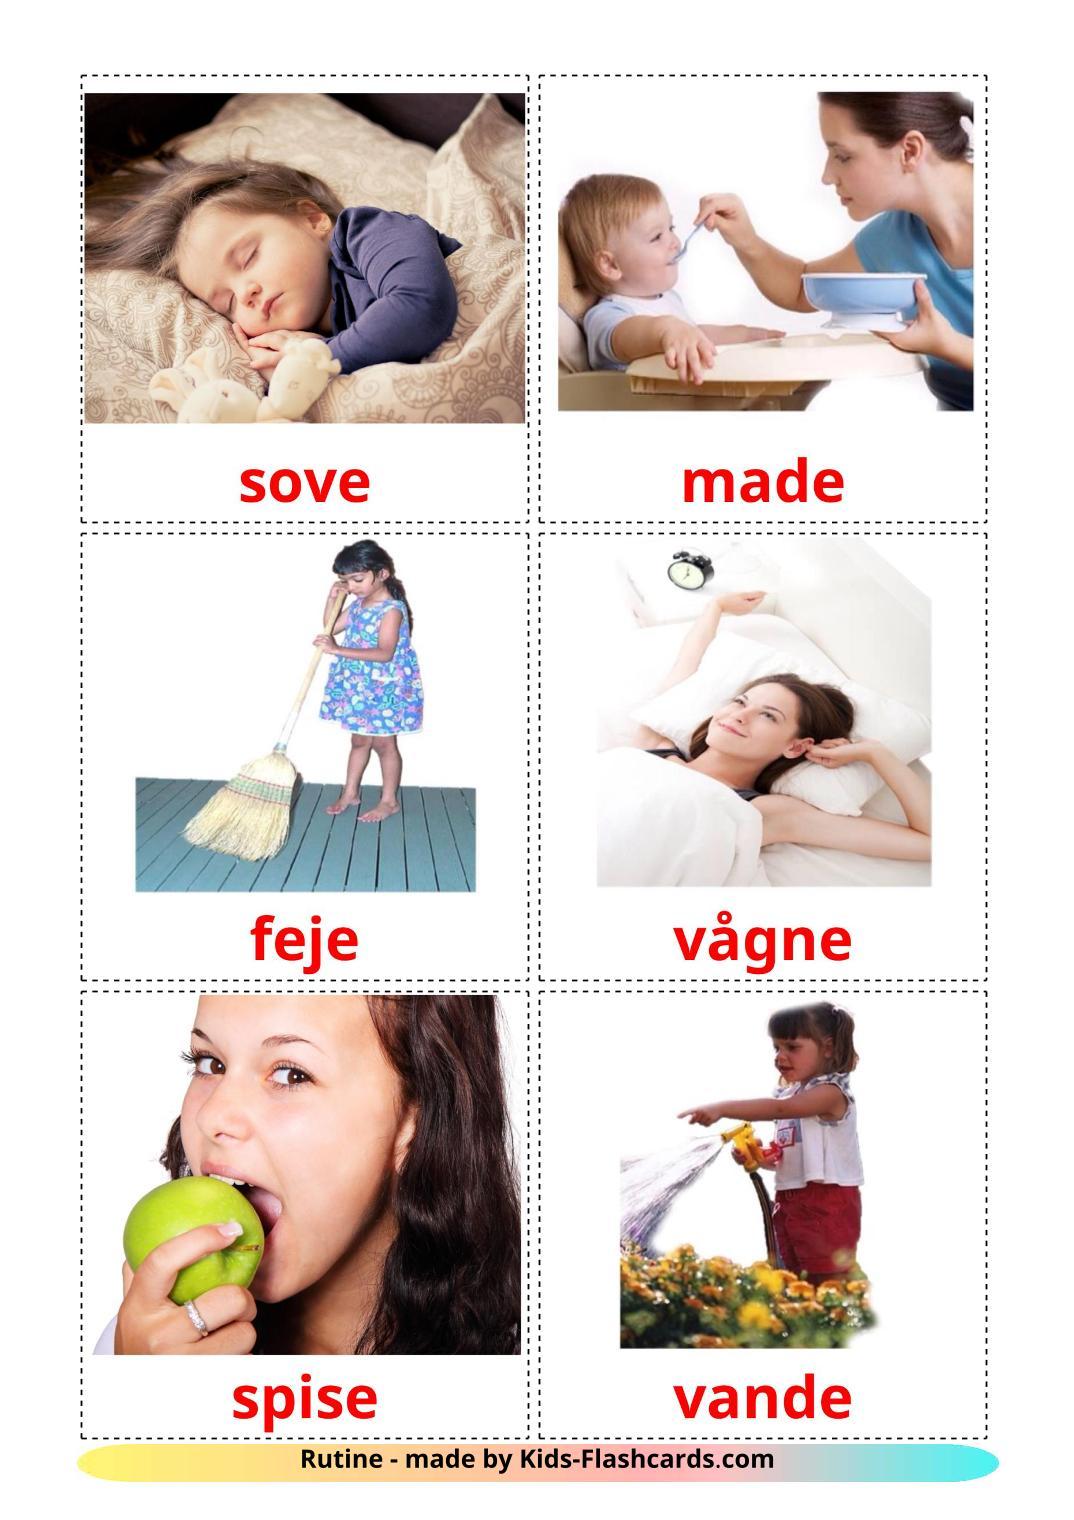 Routine verbs - 33 Free Printable dansk Flashcards